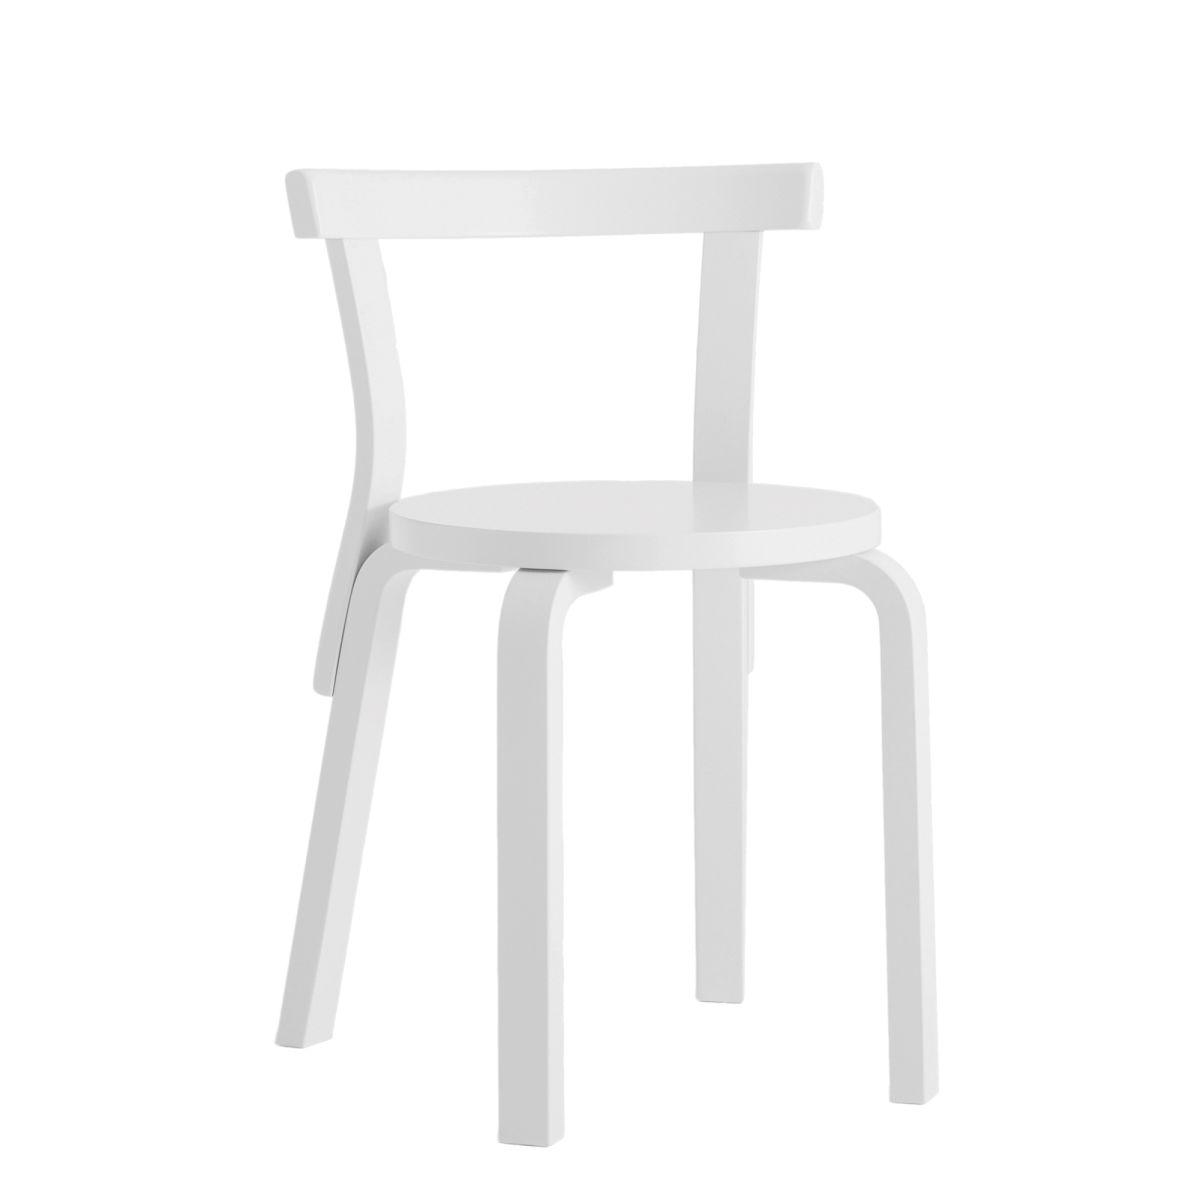 Chair 68 white lacquer